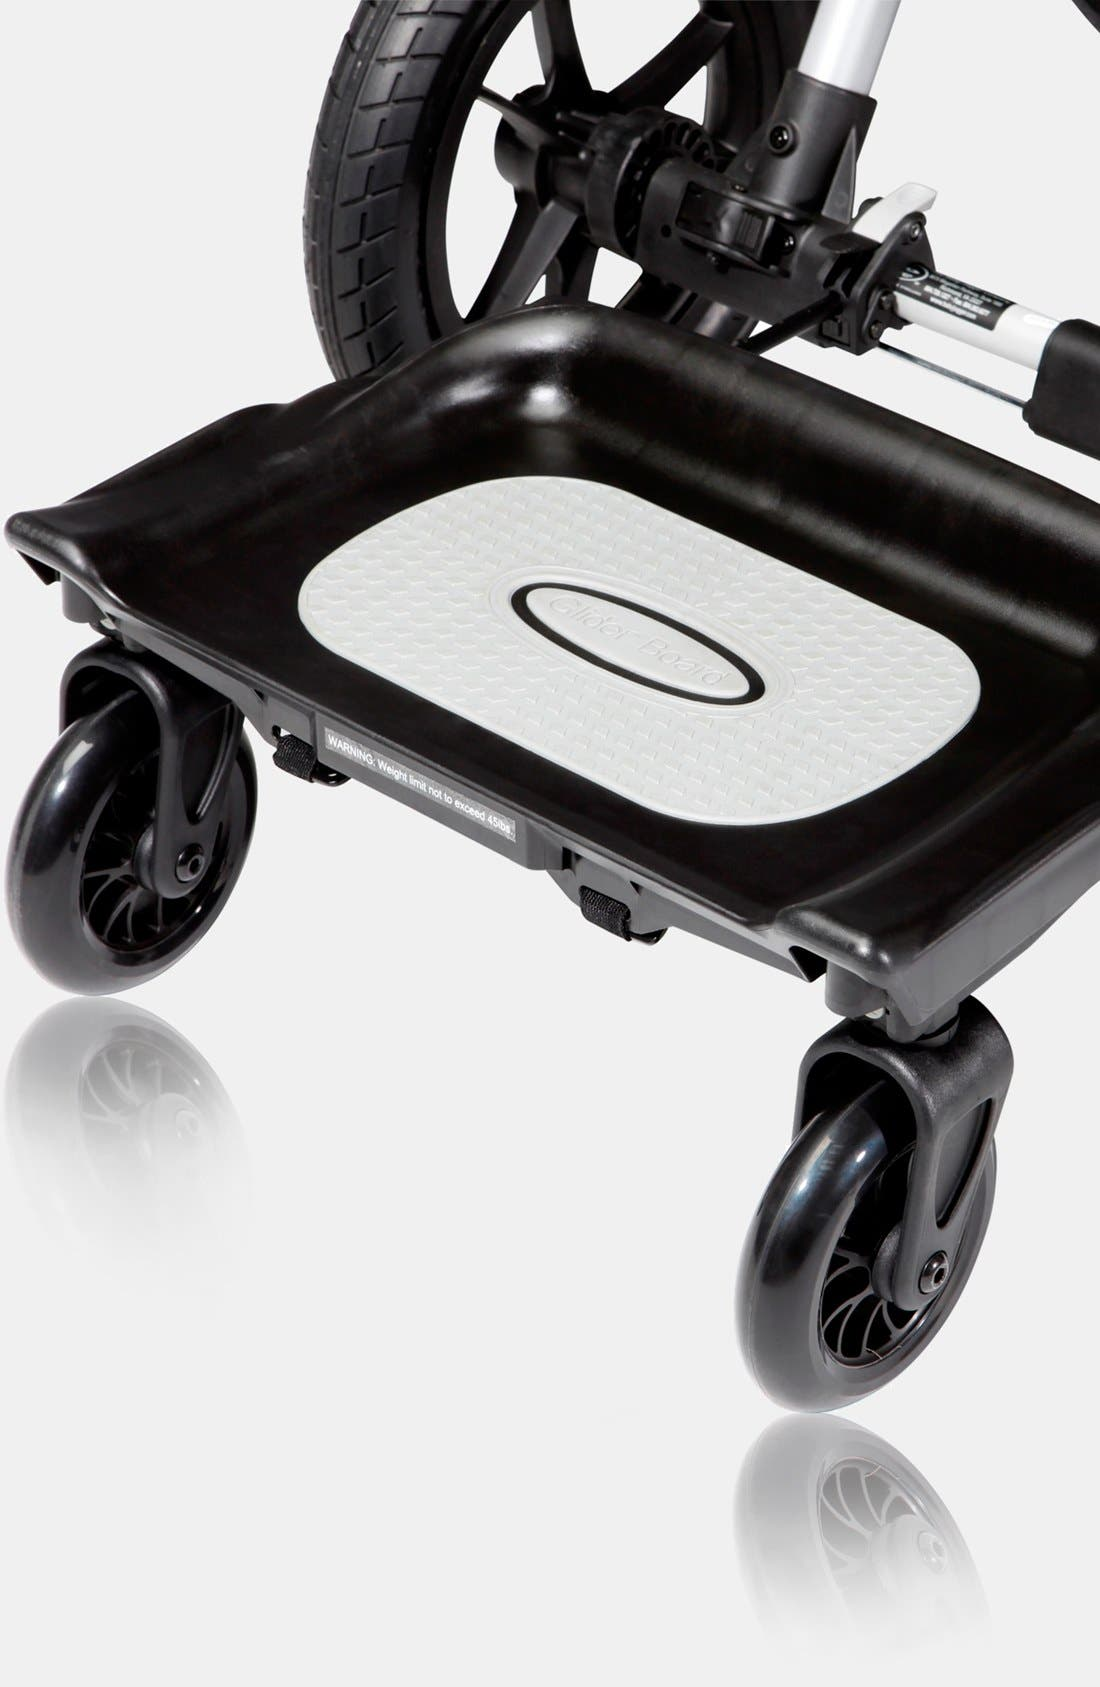 Main Image - Baby Jogger 'Glider Board' Stroller Attachment